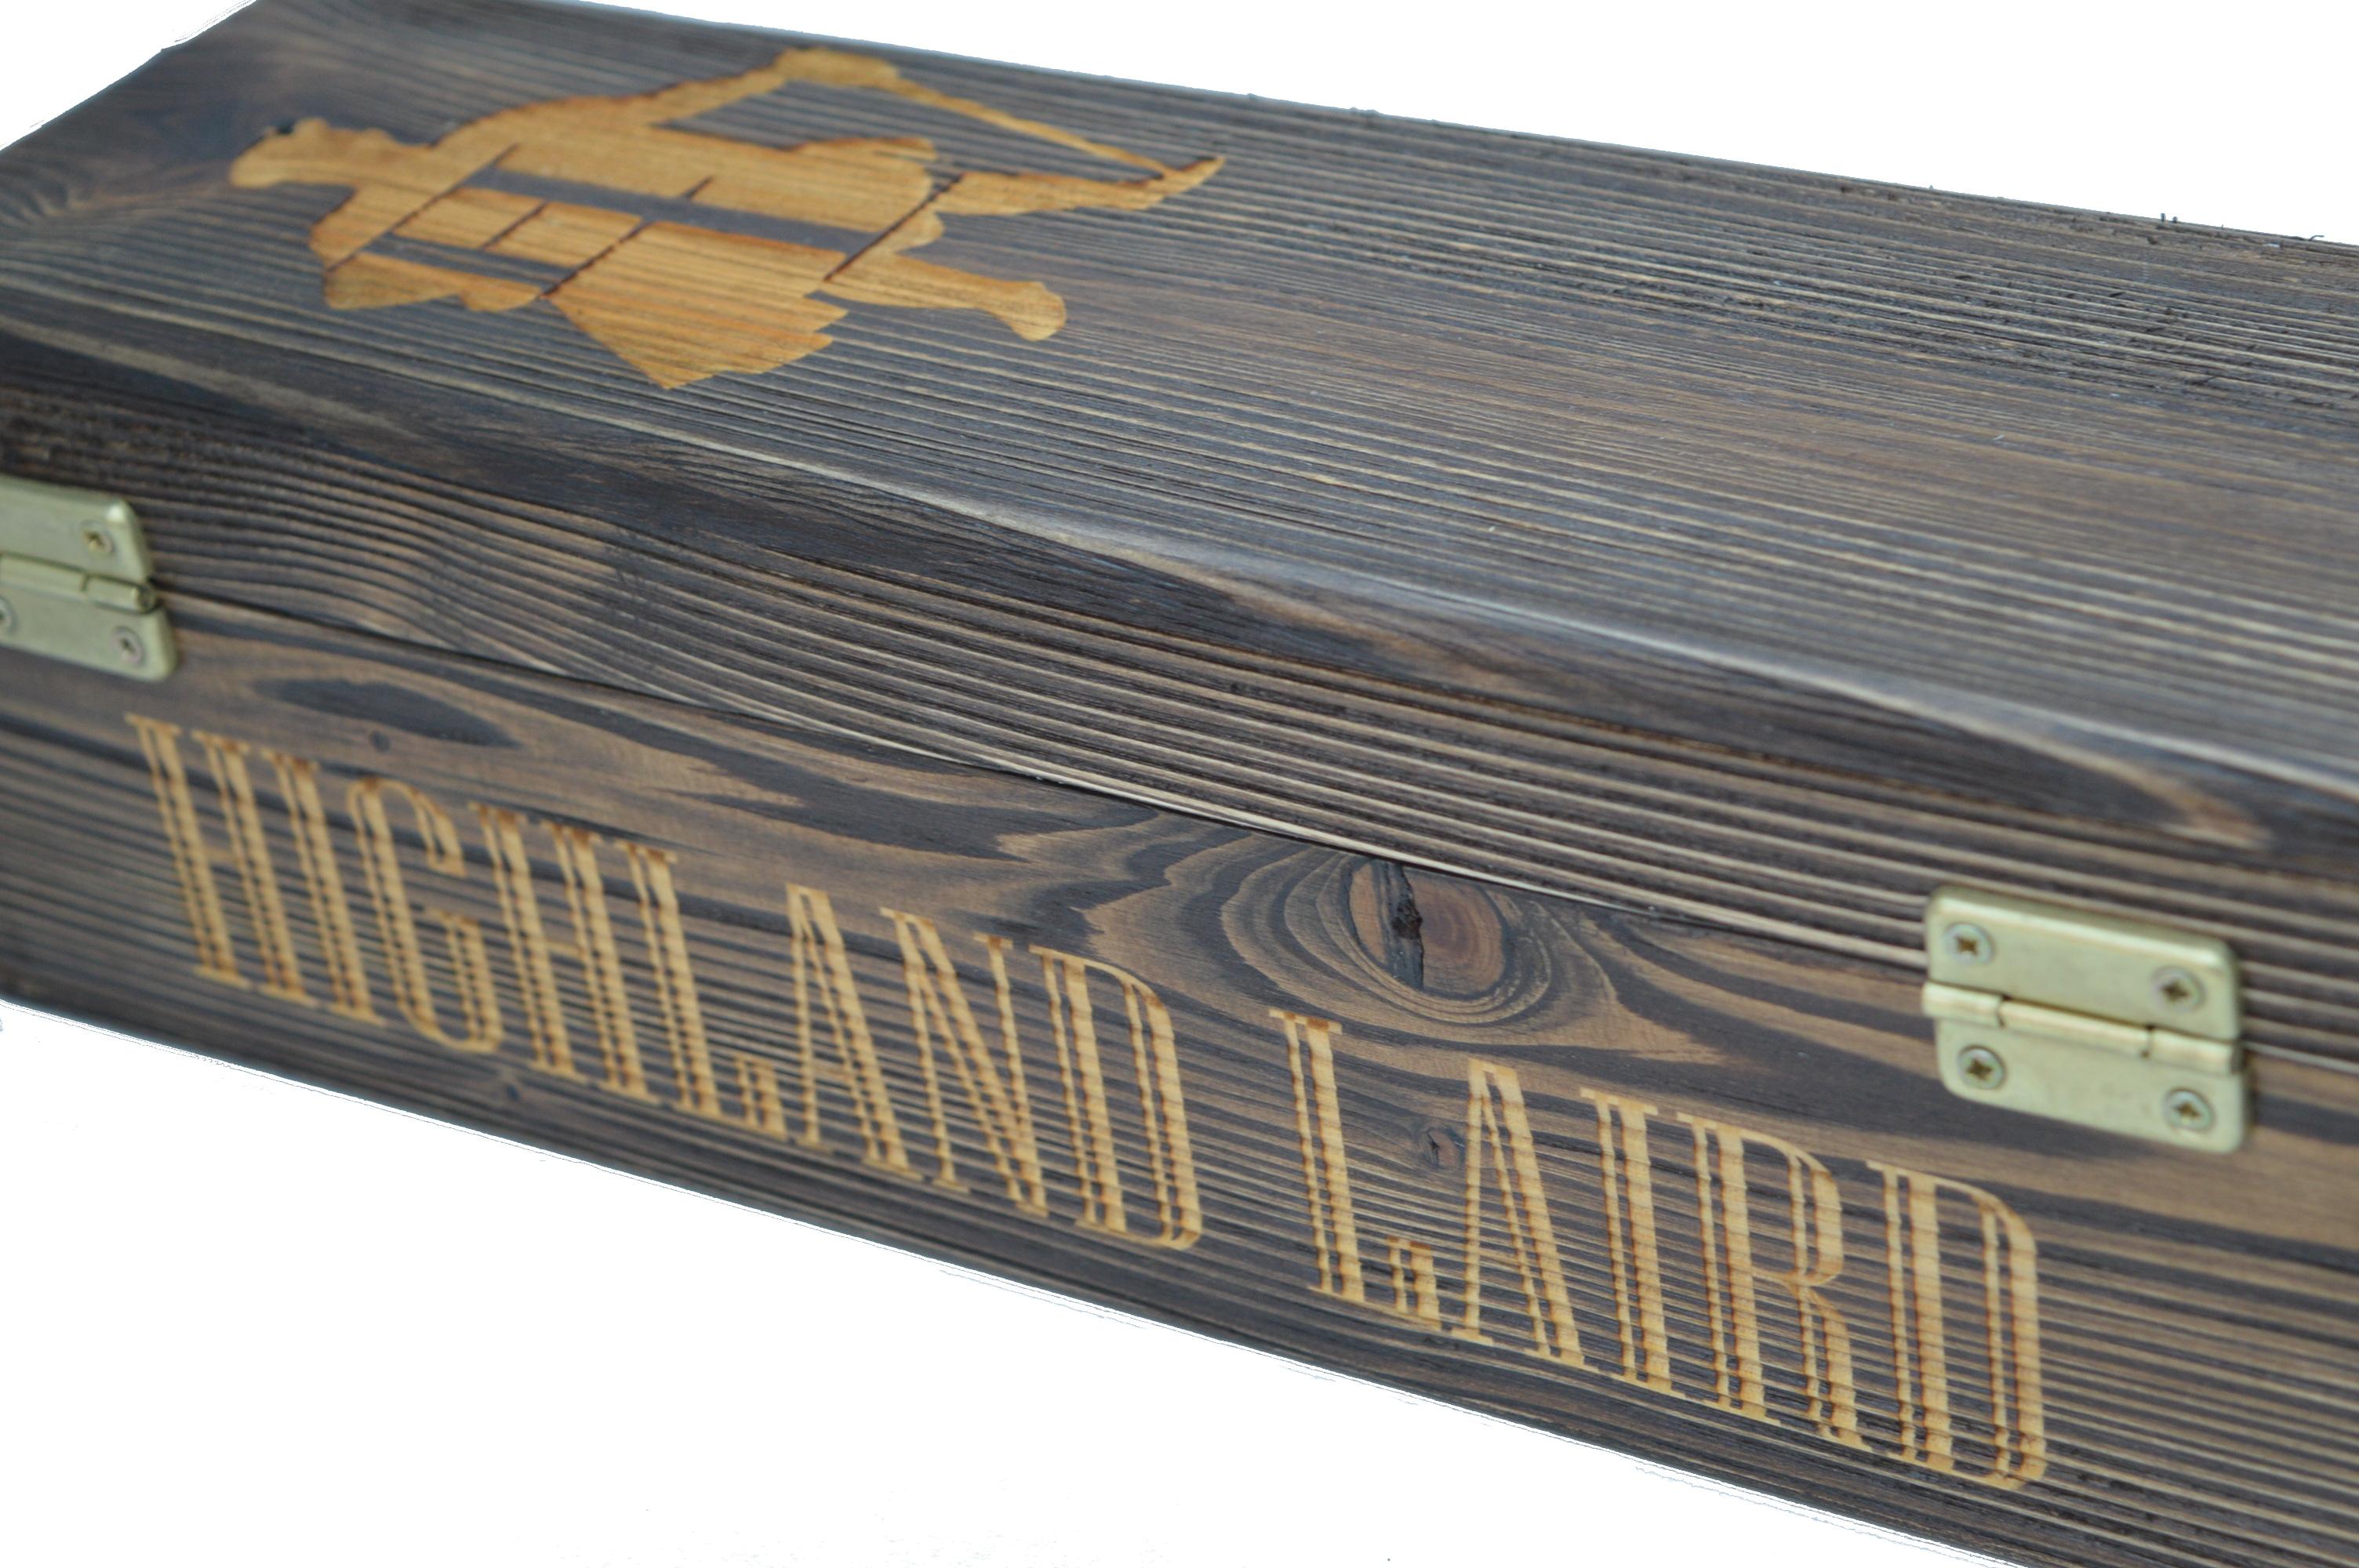 Highland Laird box white background